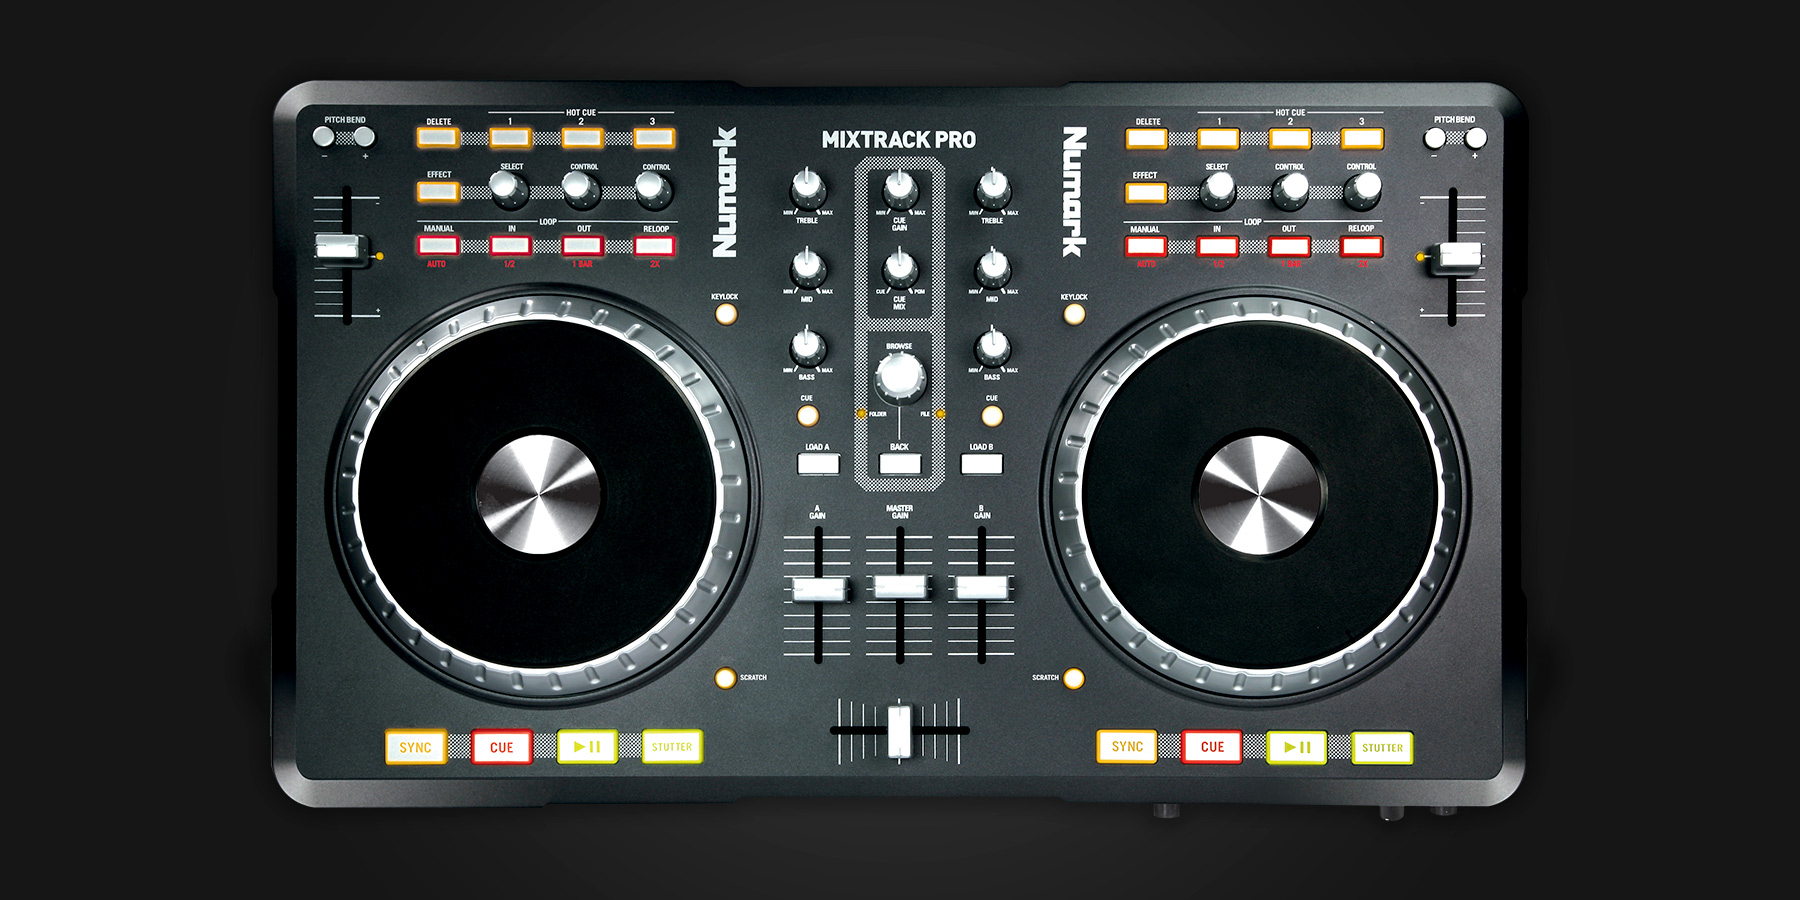 Numark Mixtrack Pro Serato Dj Dj Hardware Learn More